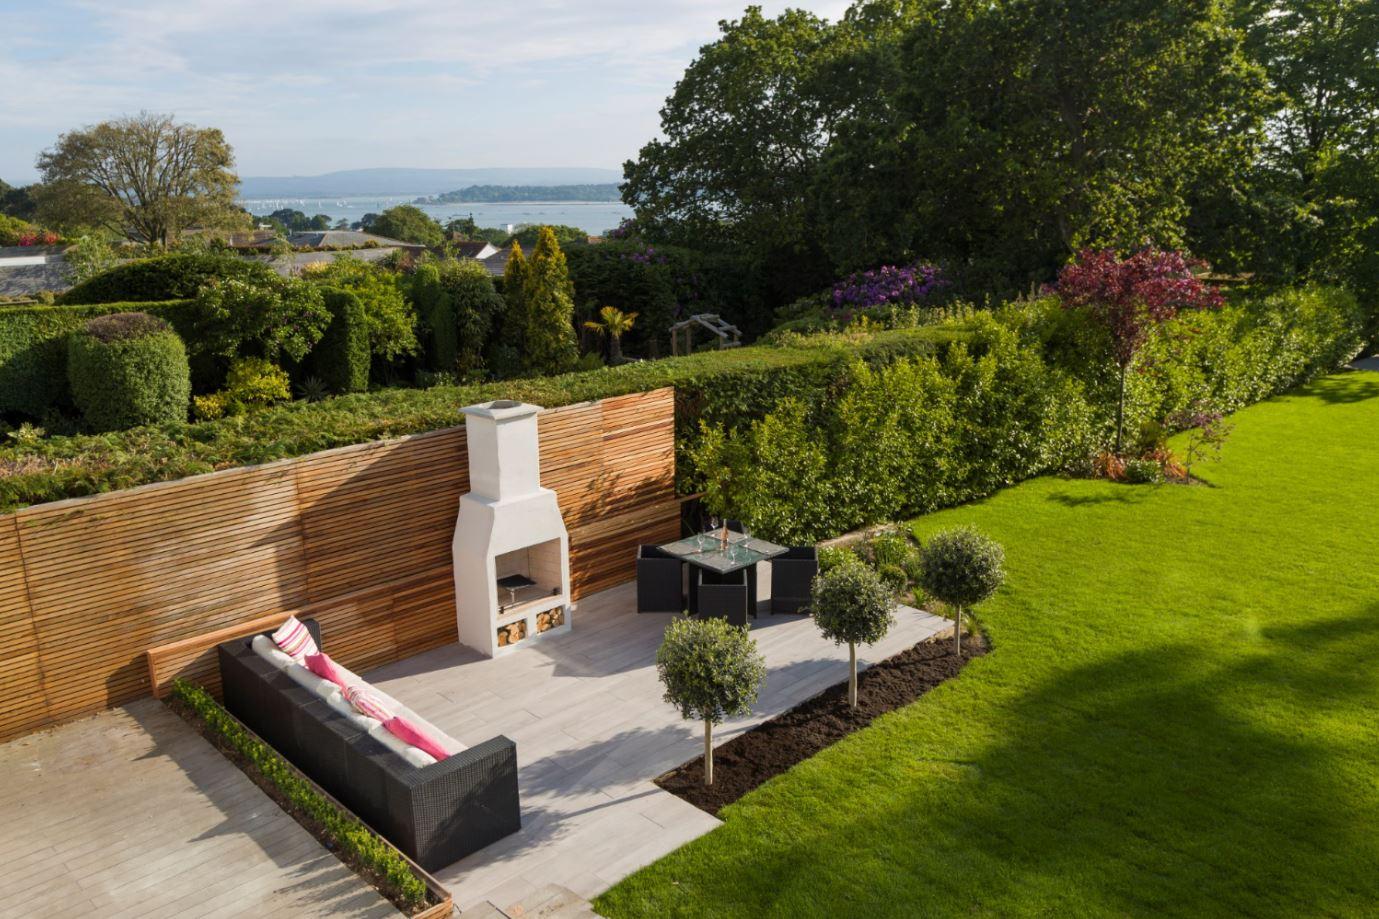 Outdoor Fireplace – The Schiedel Isokern Garden Fireplace